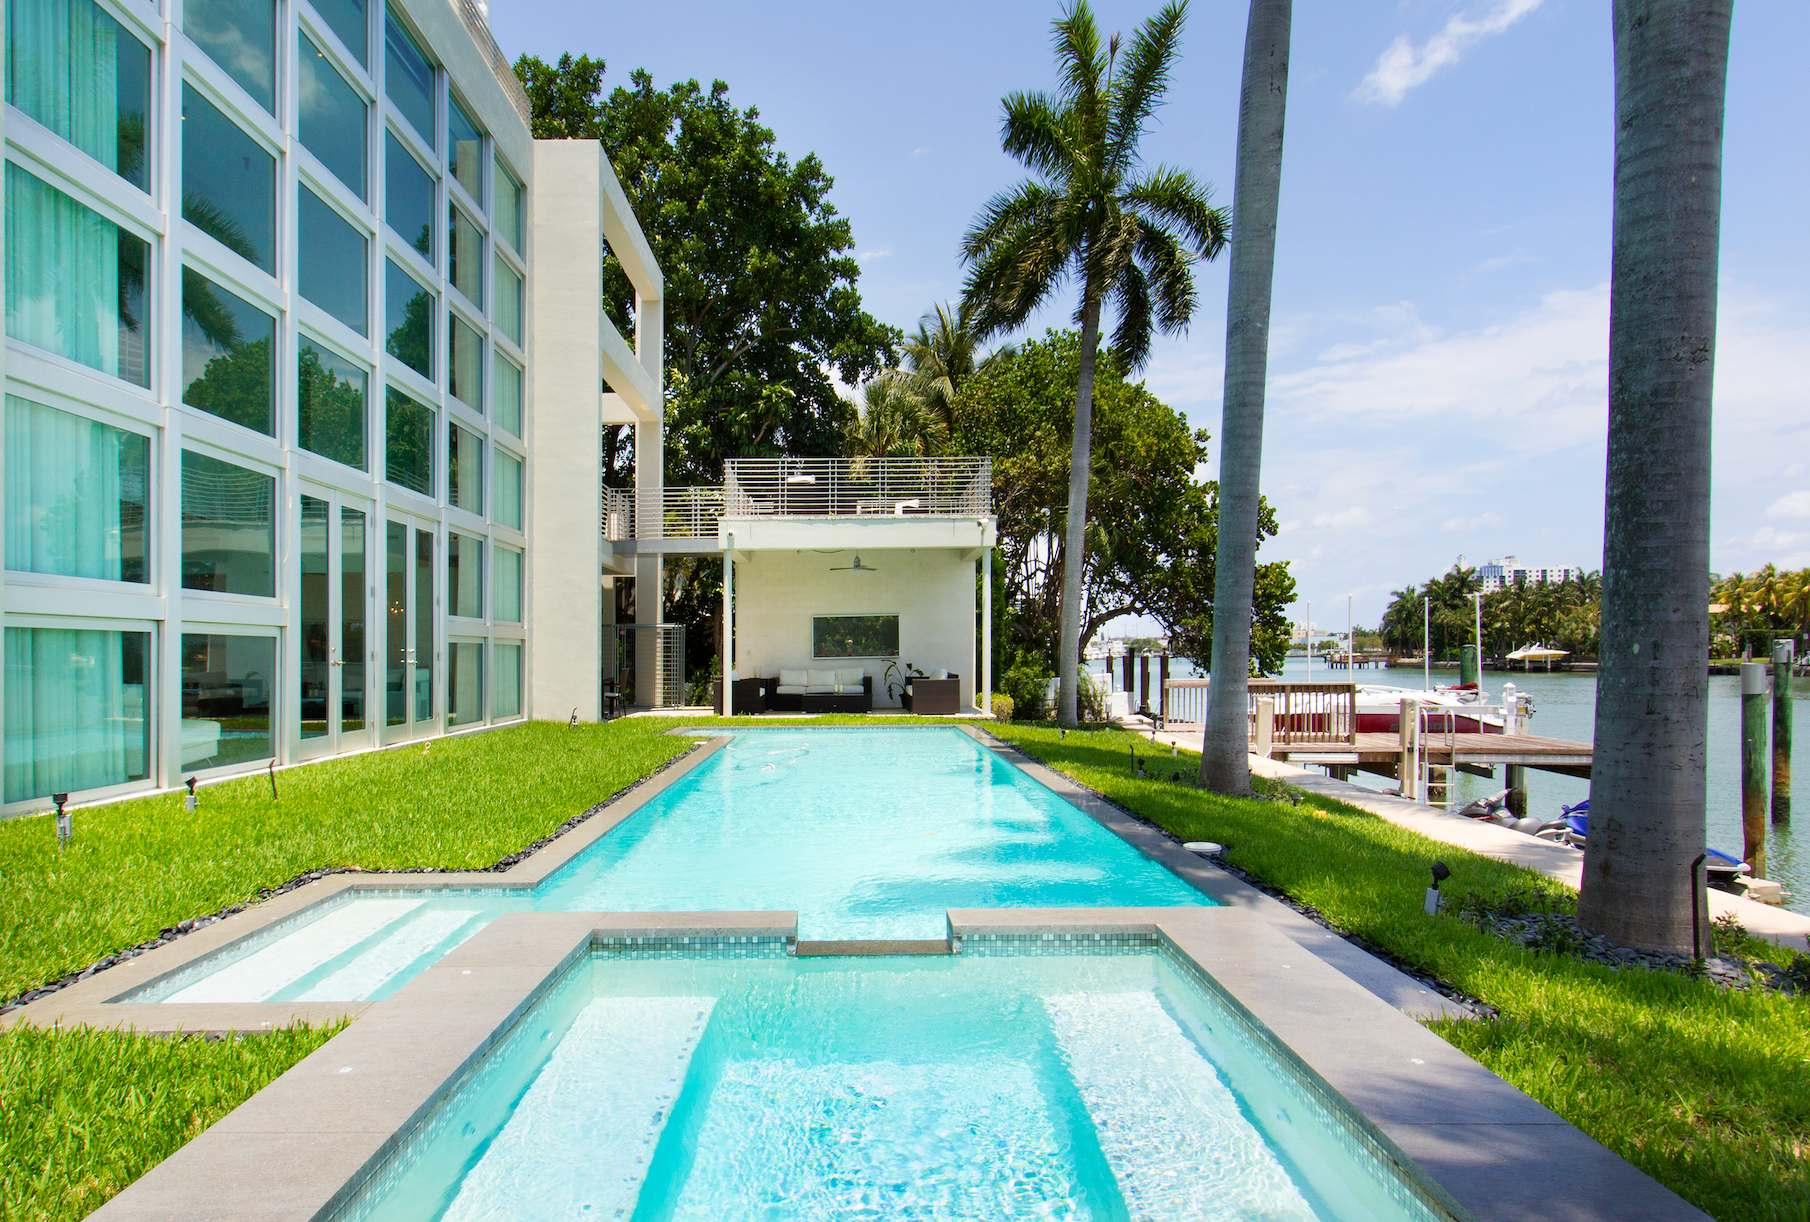 Lil Wayne's La Gorce Island mansion just sold for $10 million.